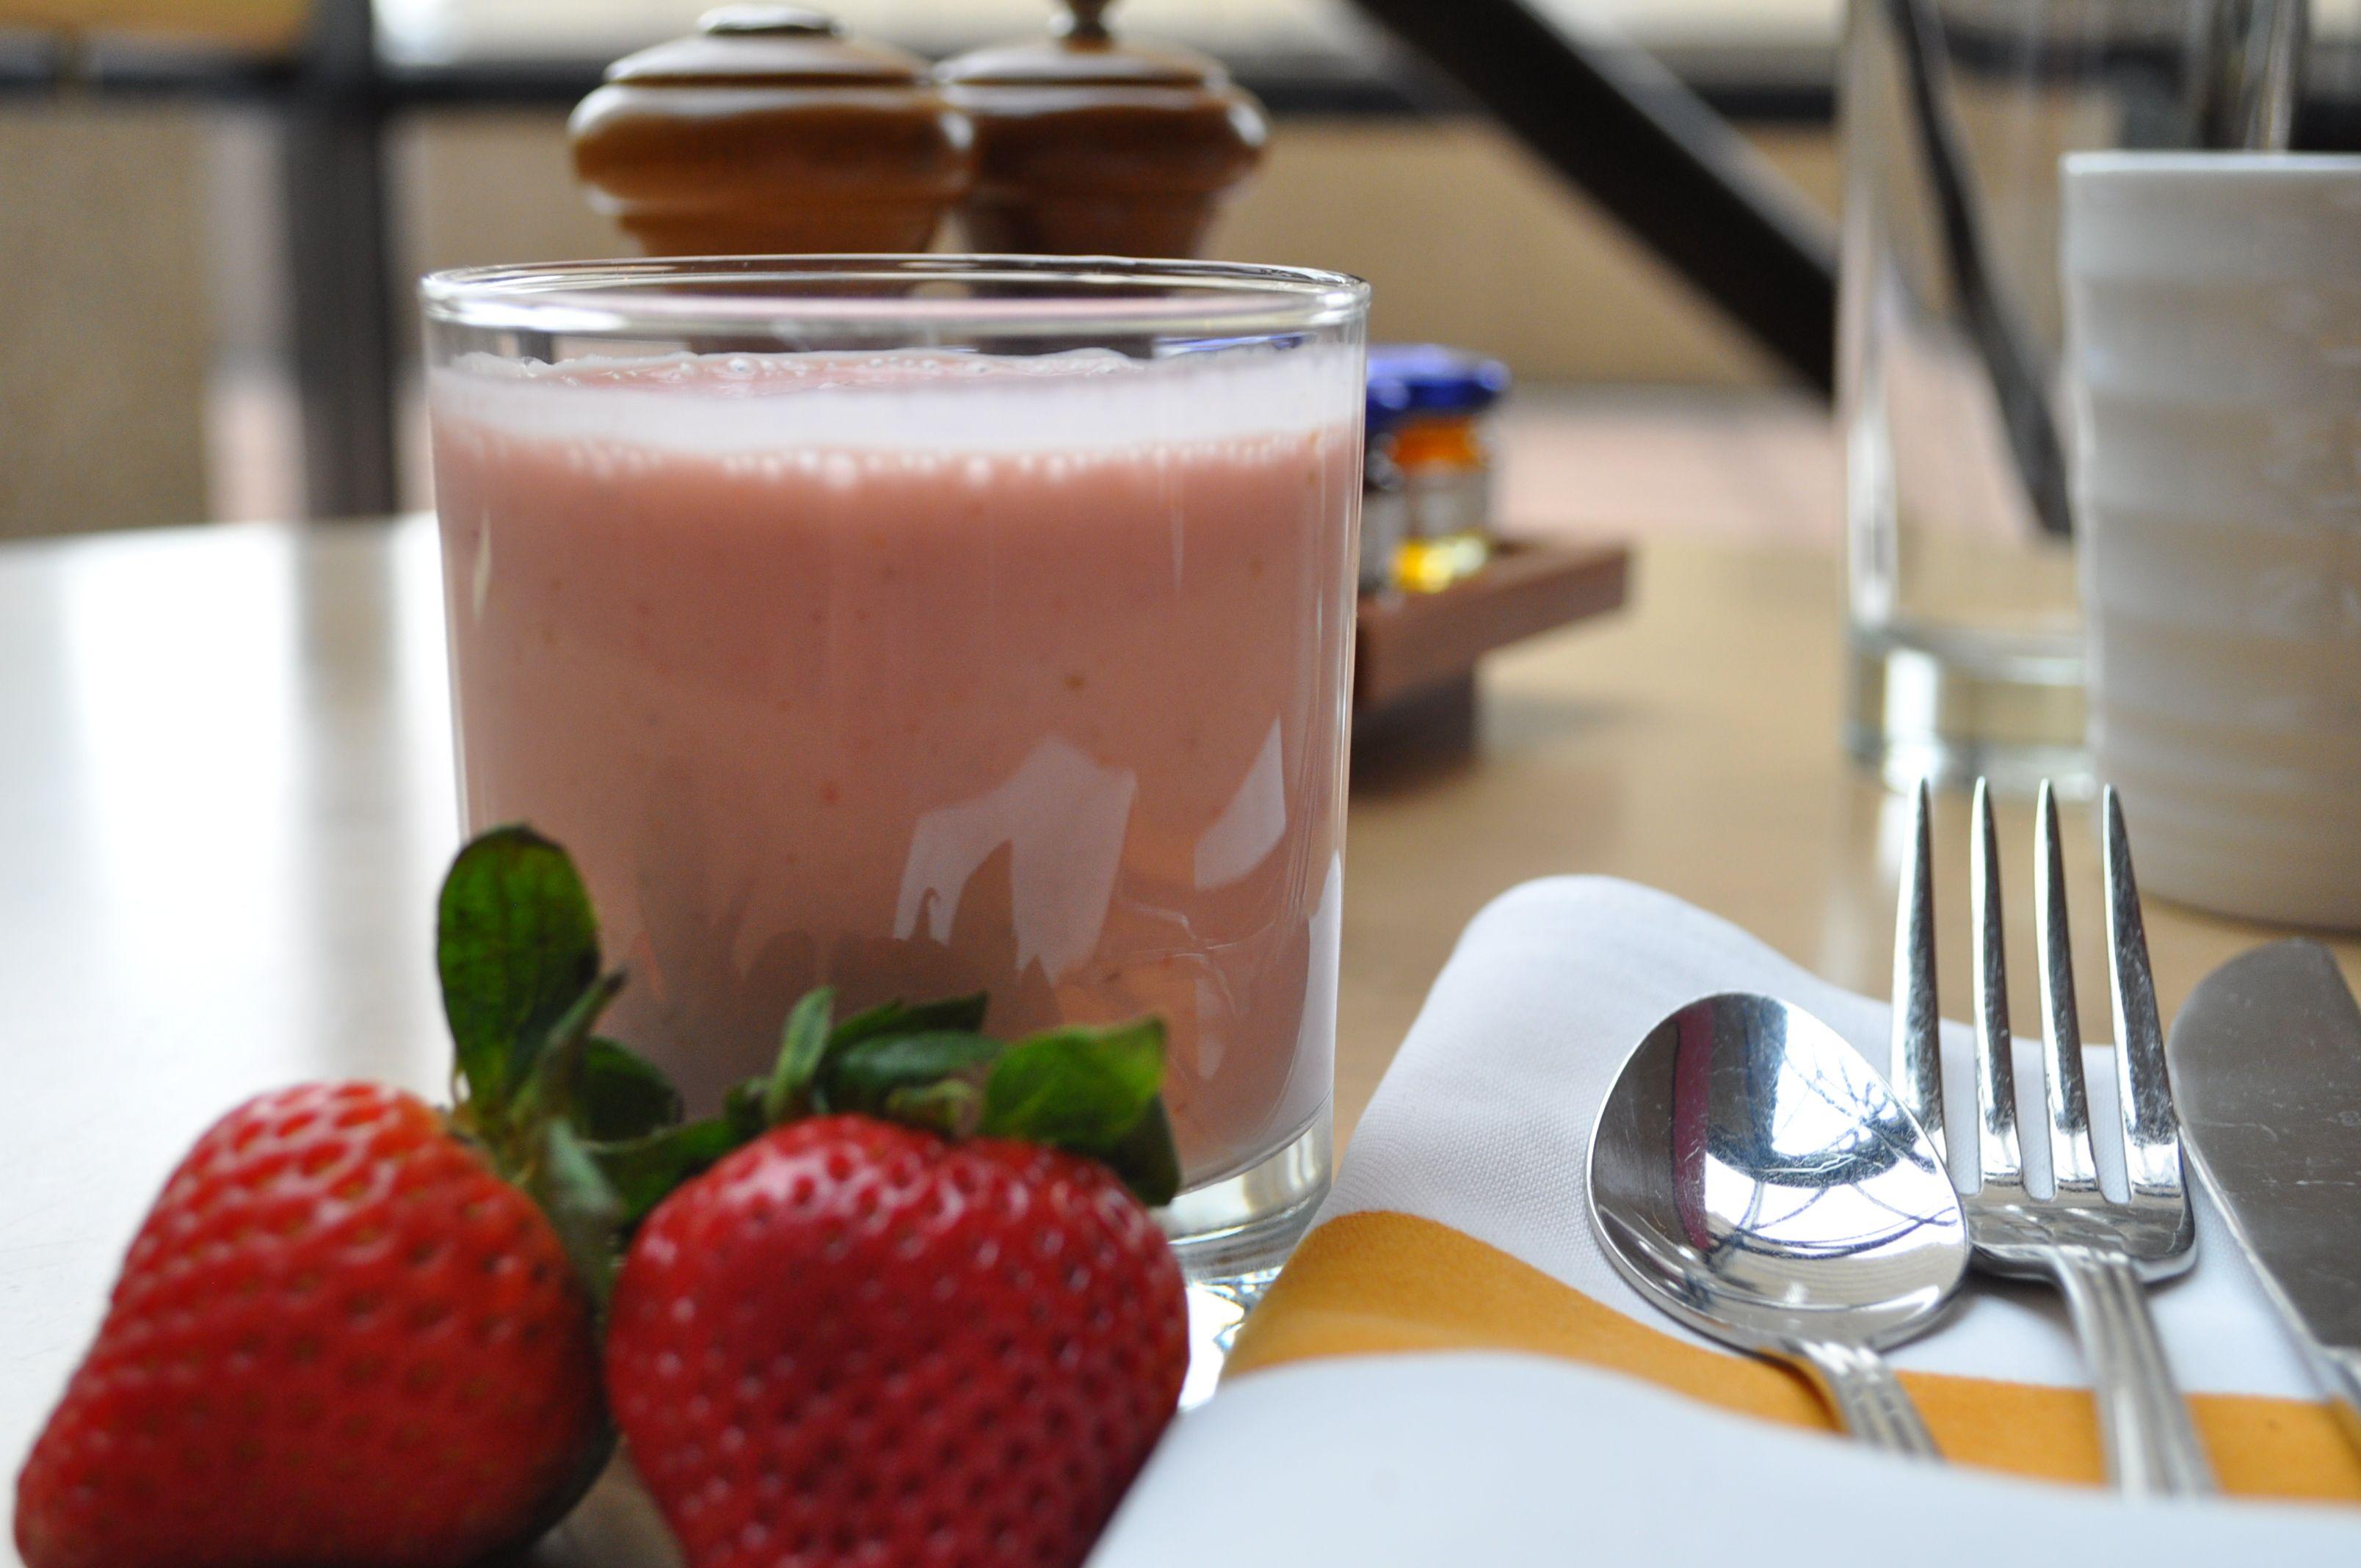 Strawberry Banana Smoothie - Cinnabar at Hyatt Regency Crystal City